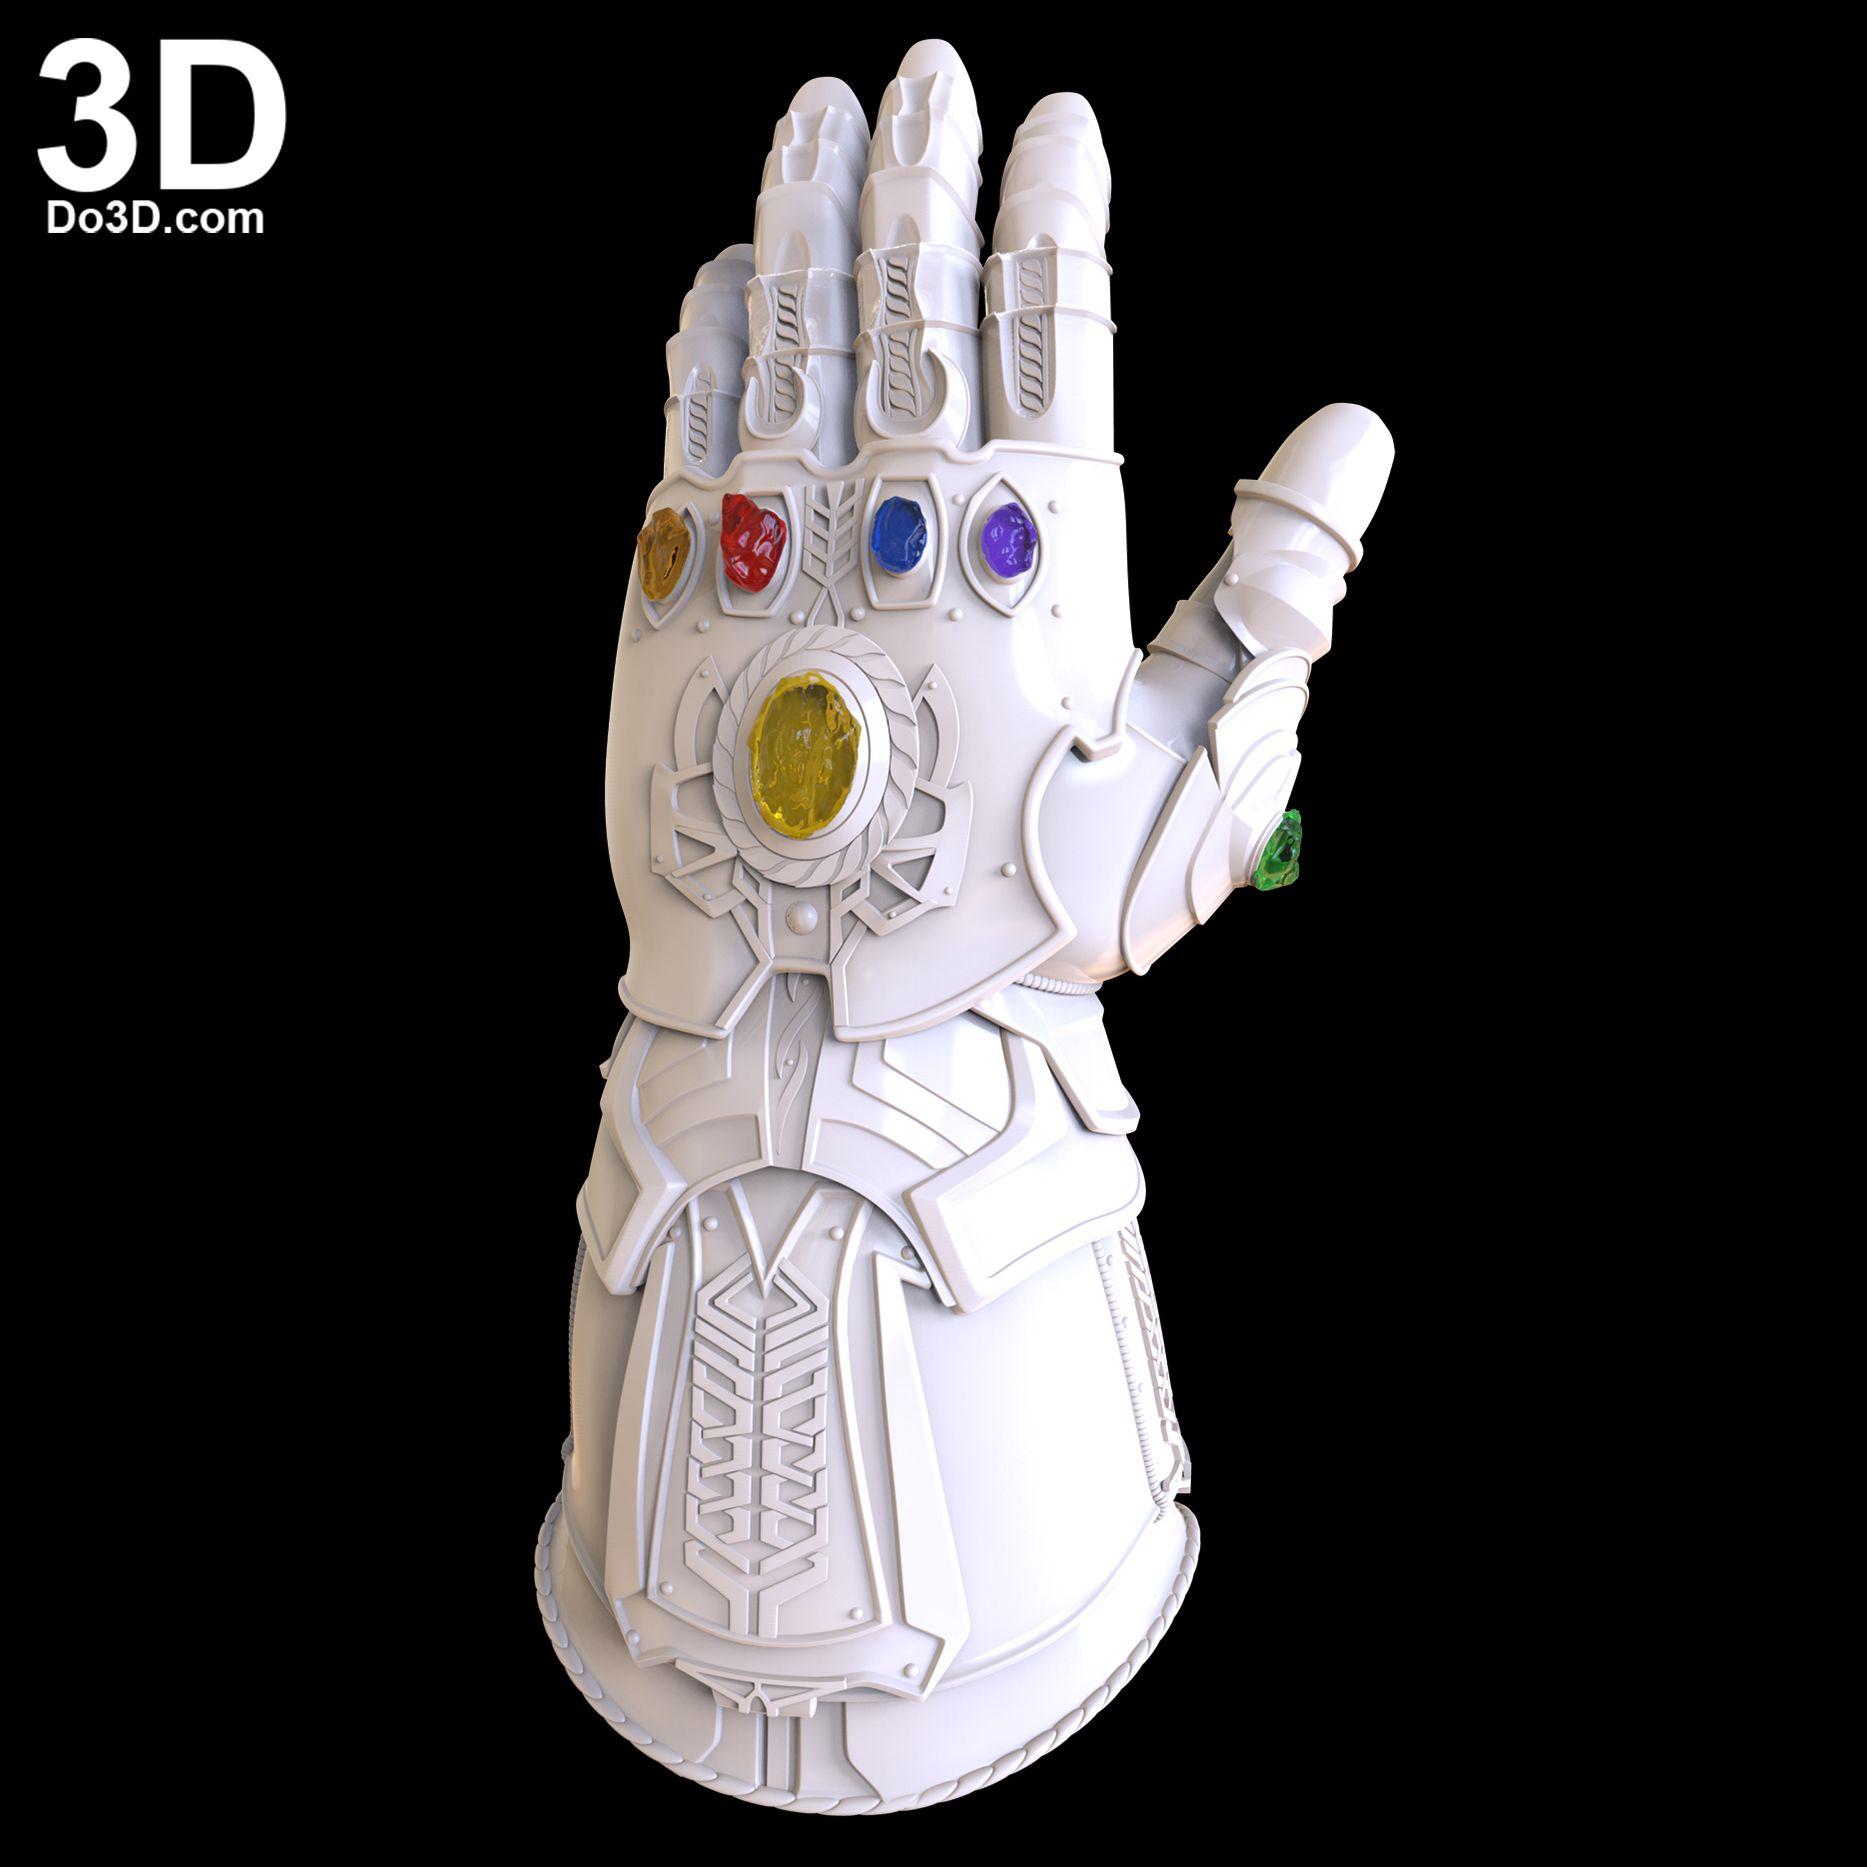 3d printable model thanos gauntlet forearm glove d23 avengers infinity war version print file format stl do3dcom